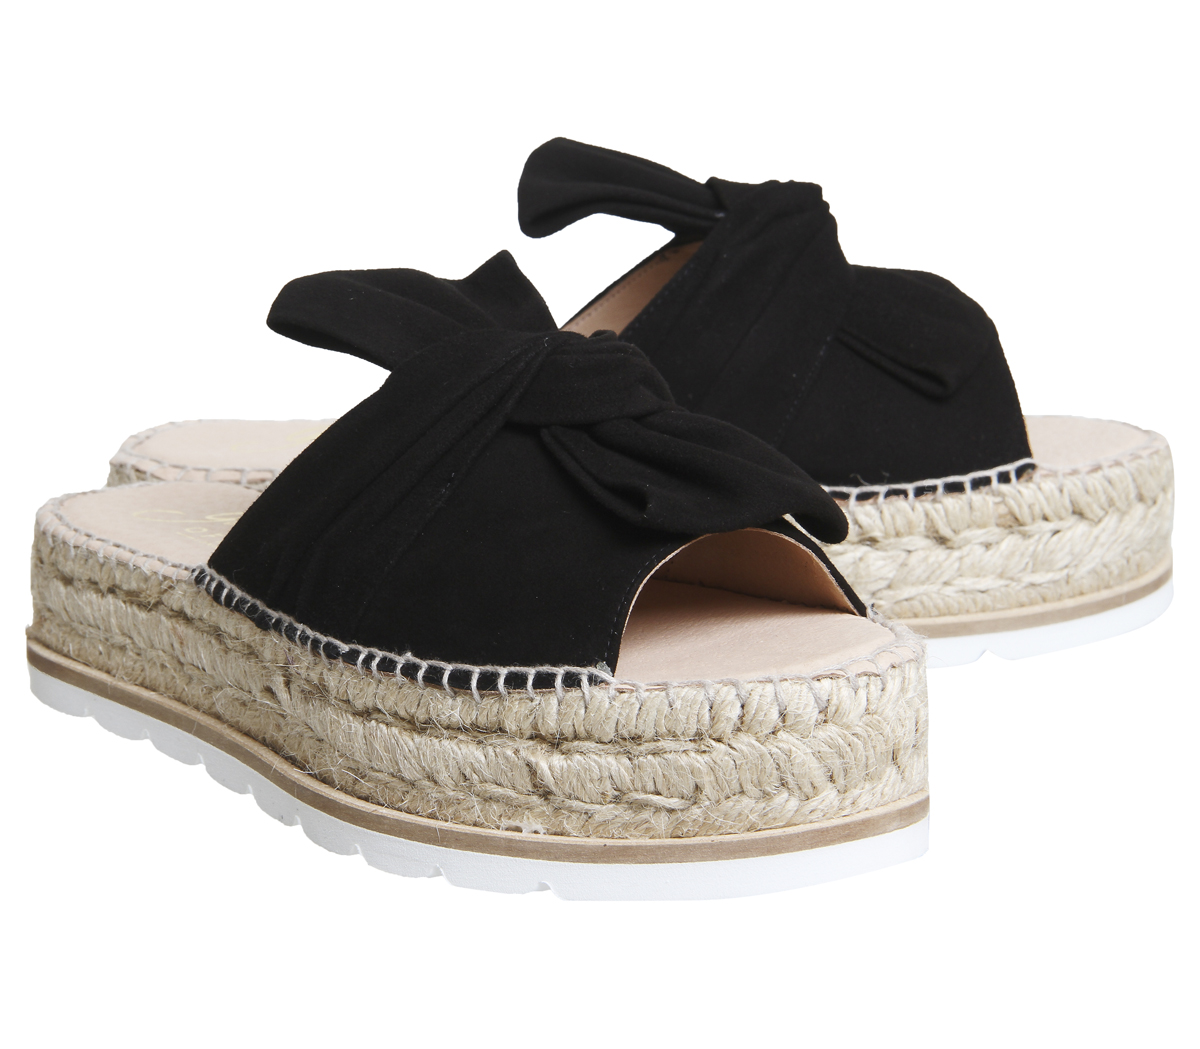 Damenschuhe Gaimo for OFFICE SUEDE Samanta Bow Flatform Sandales BLACK SUEDE OFFICE Heels 7ea336